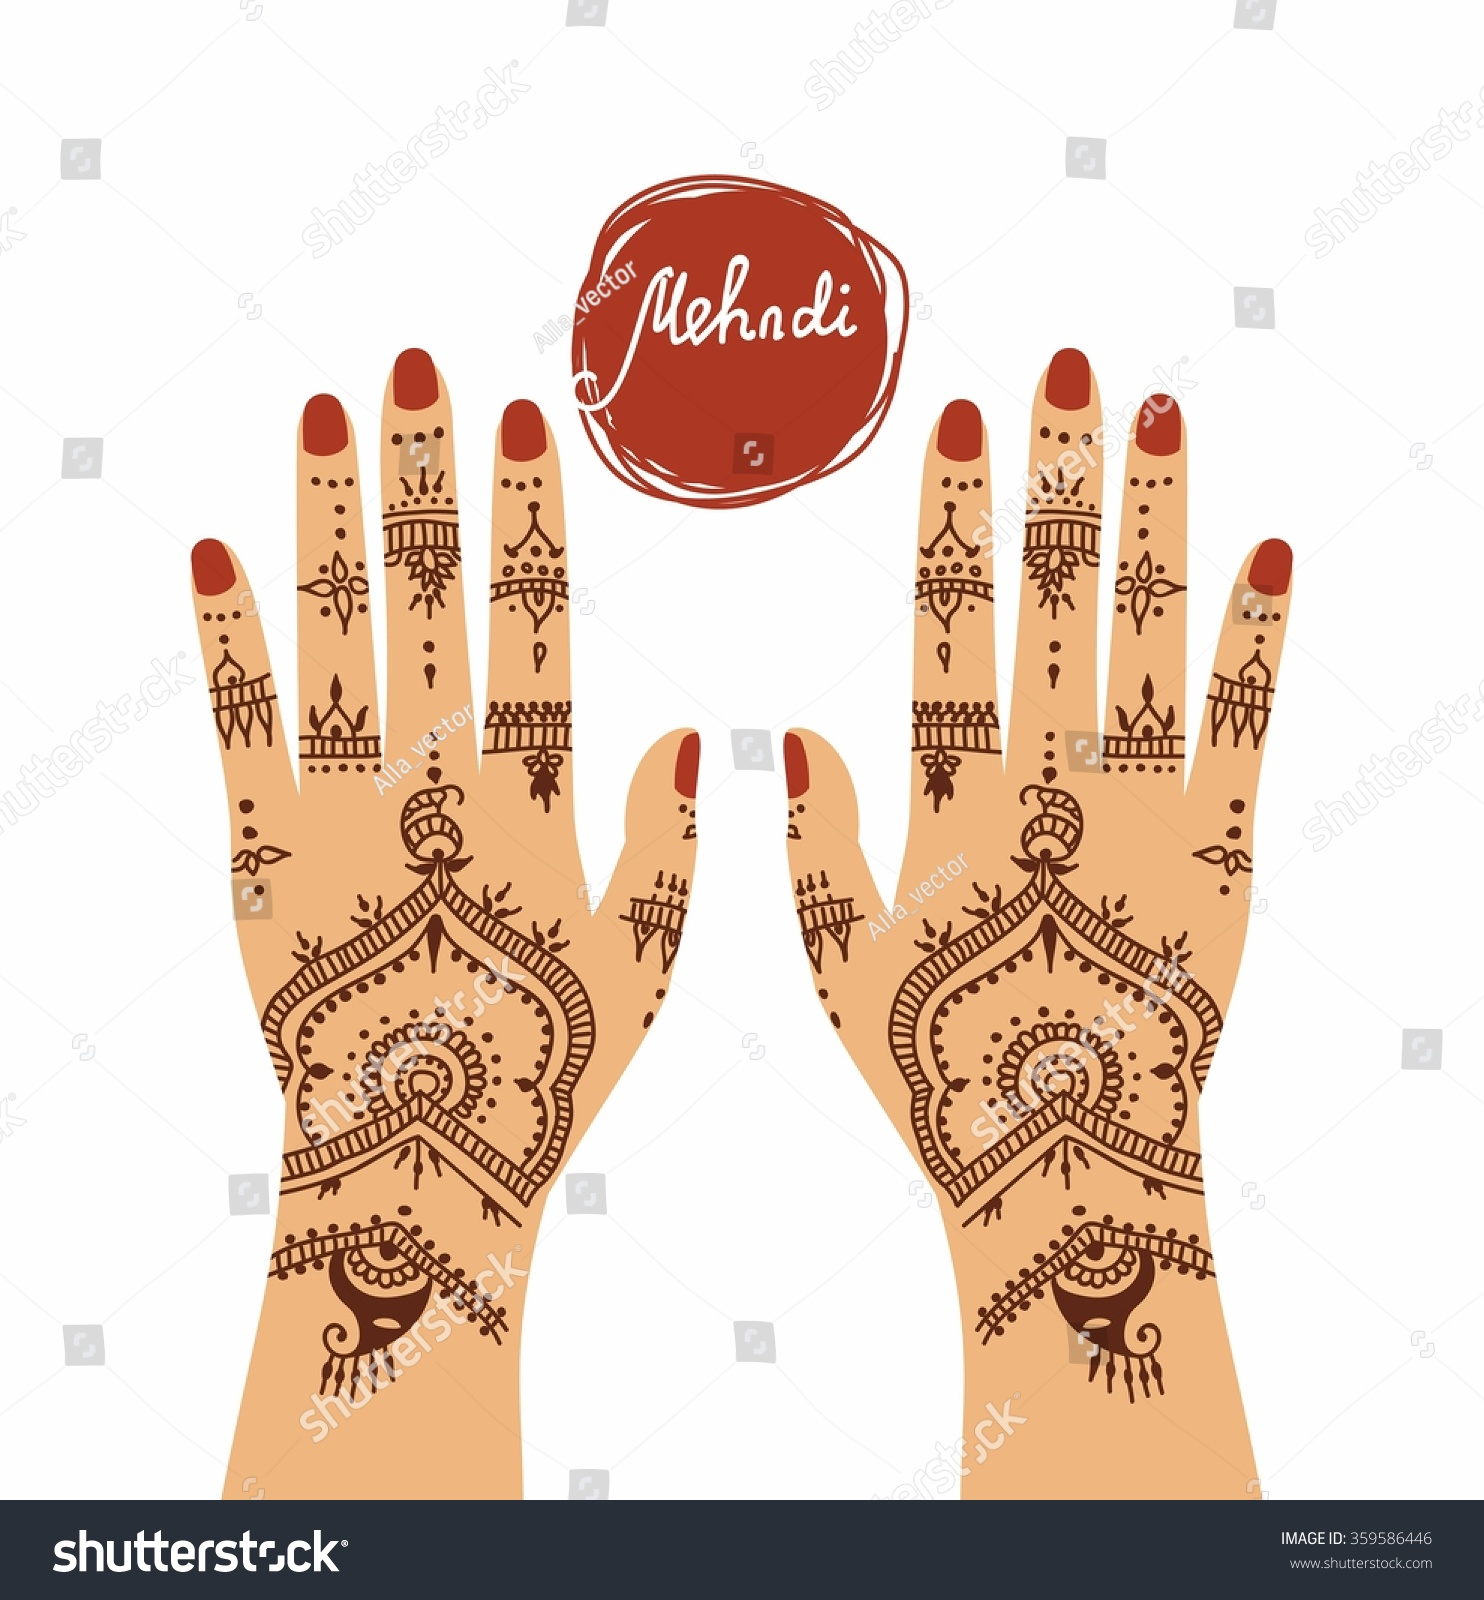 Mehndi Hands Clipart : Element yoga mudra hands mehendi patterns stock vector